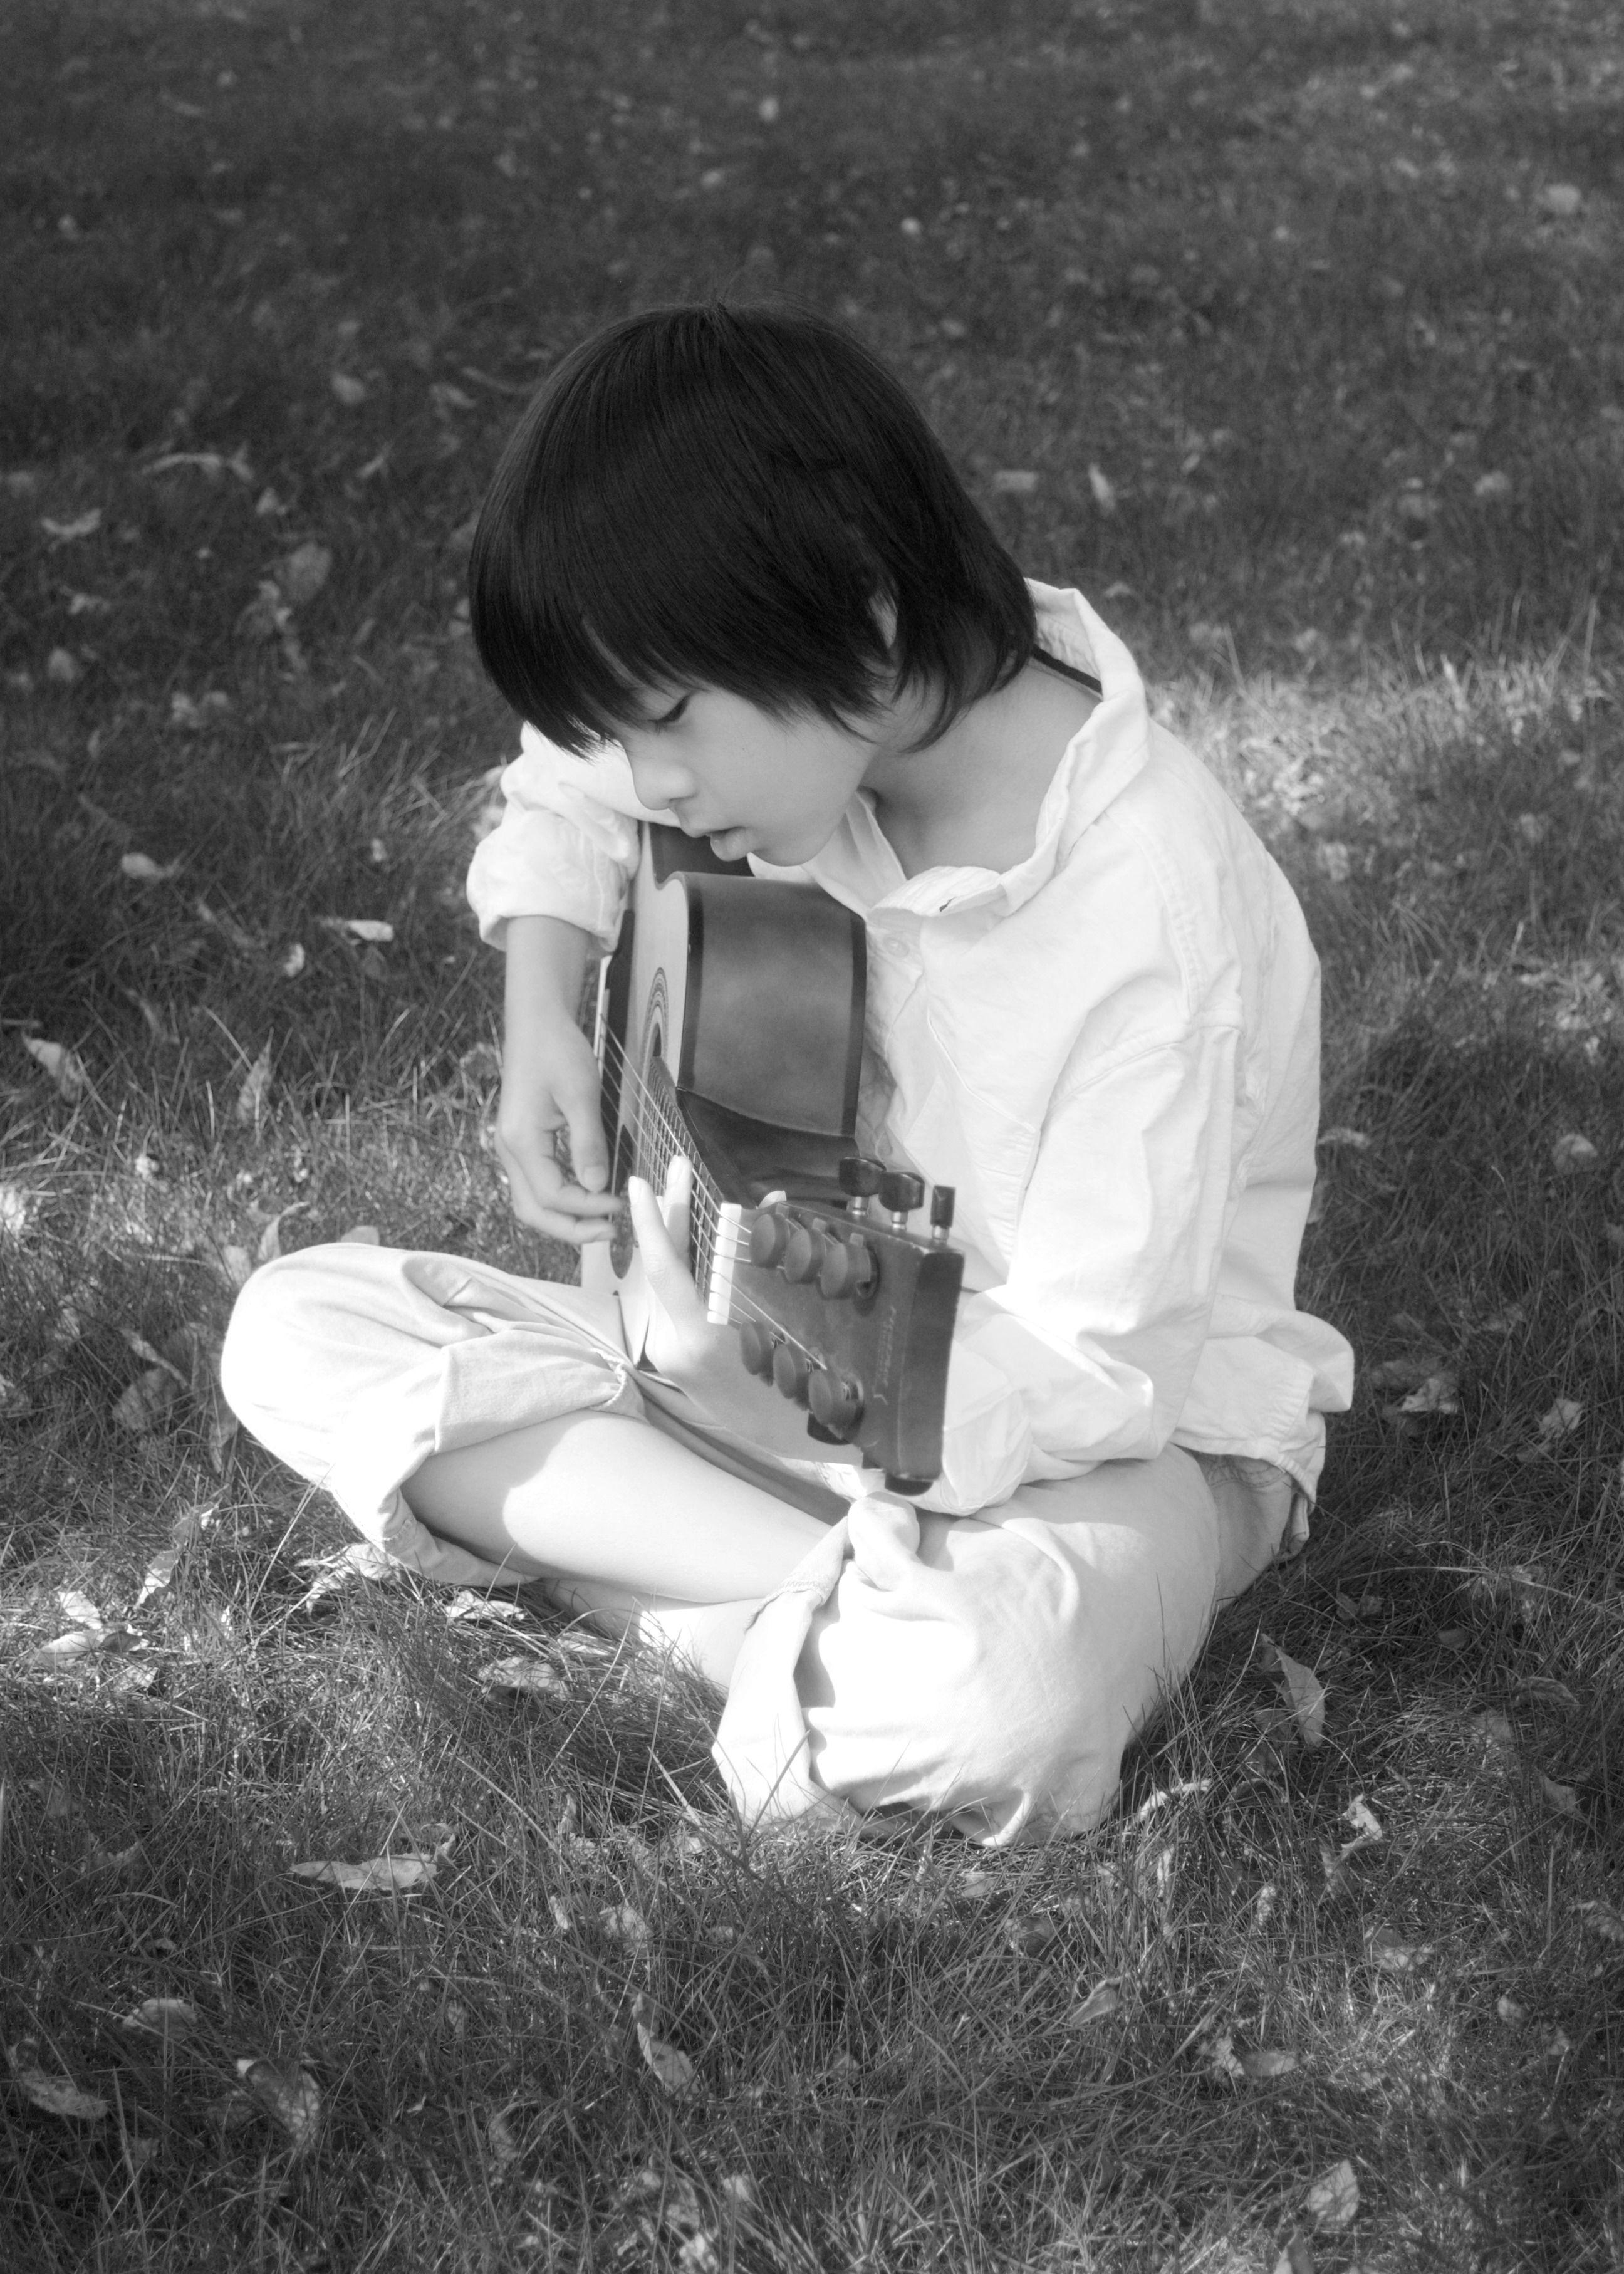 my little music-maker. | The dreamers, Backyard, Music